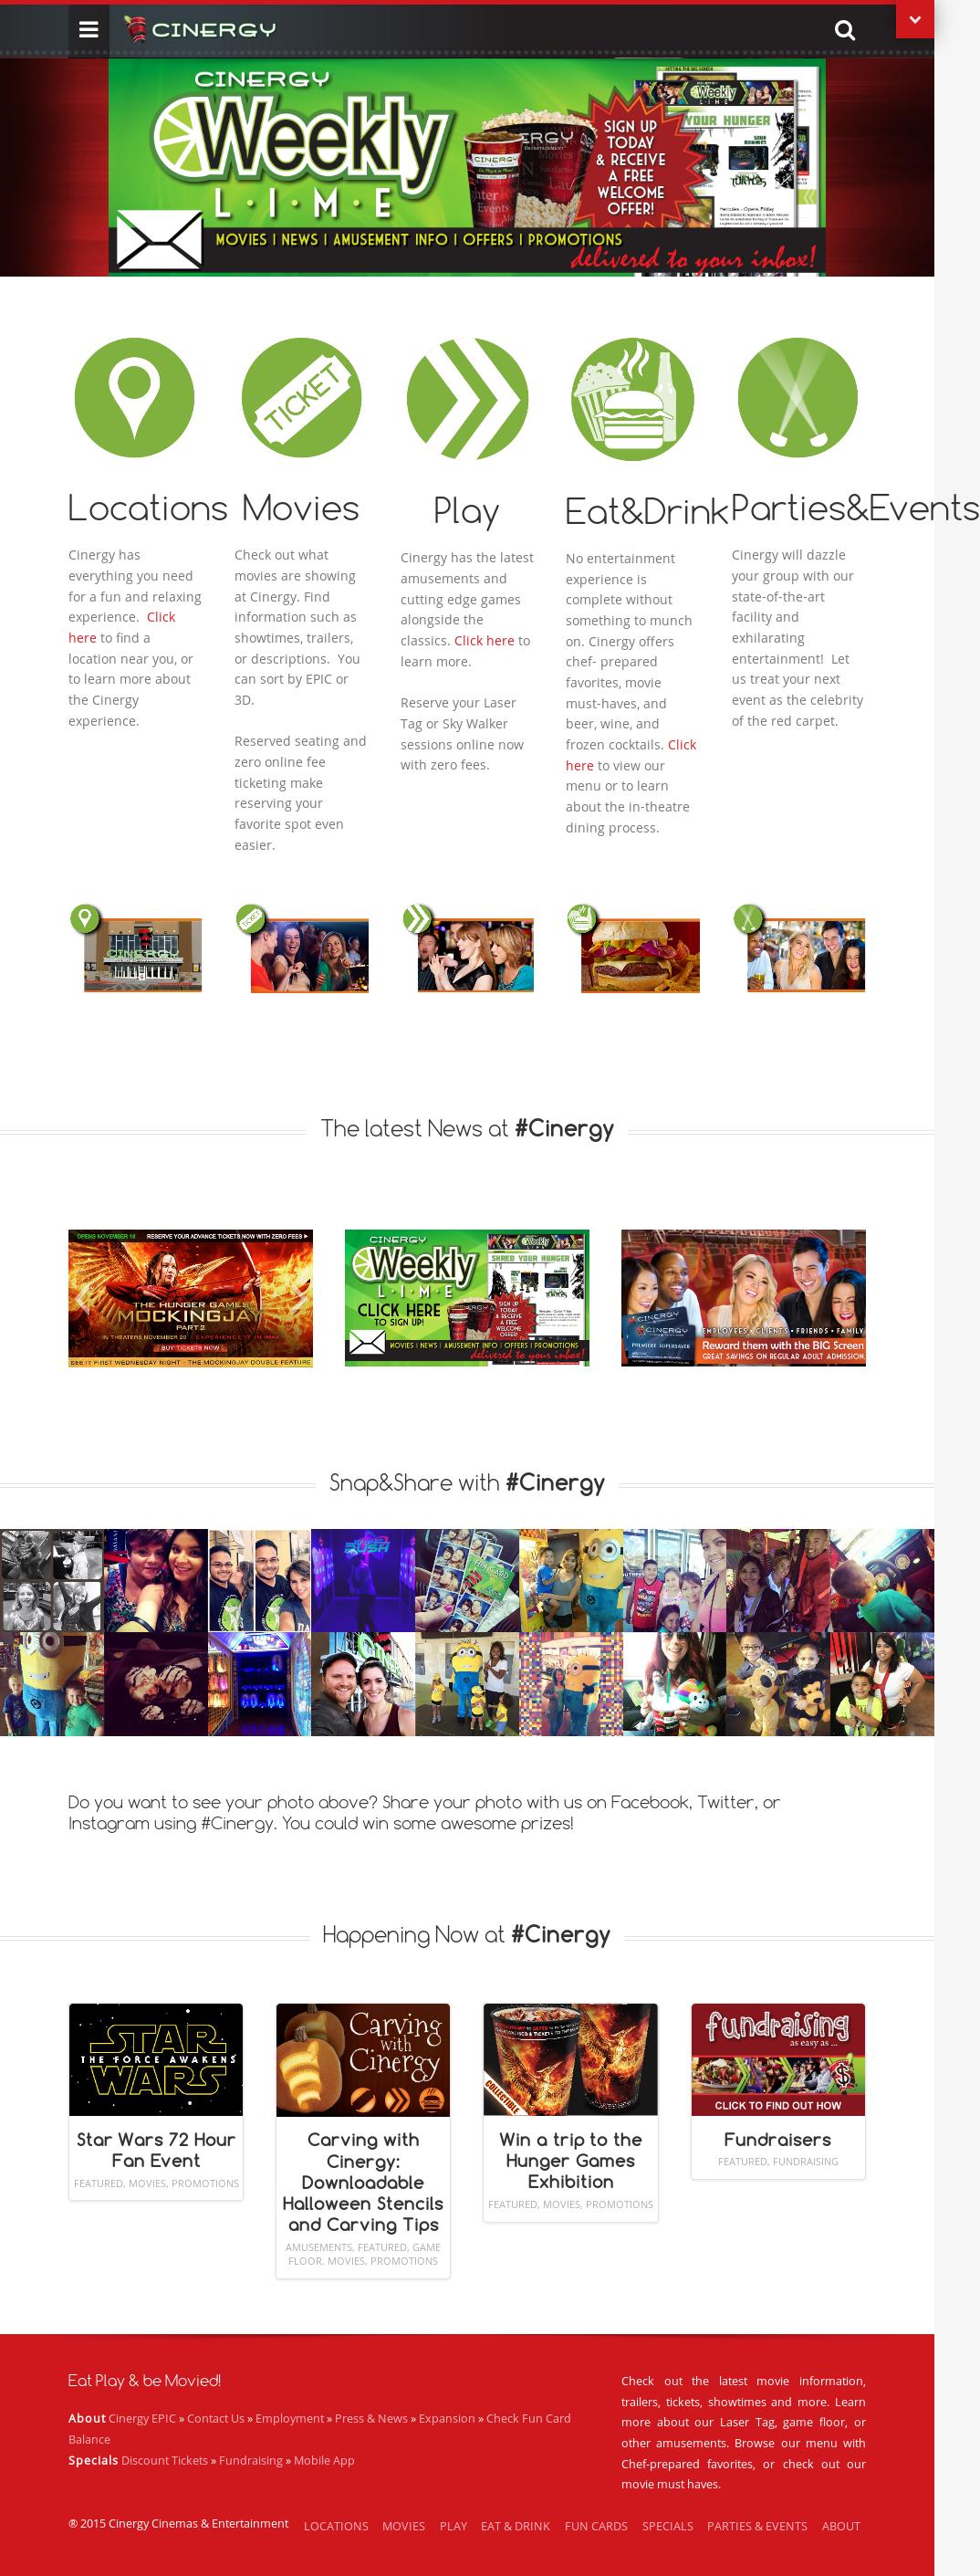 Cinergy Cinemas Competitors, Revenue and Employees - Owler